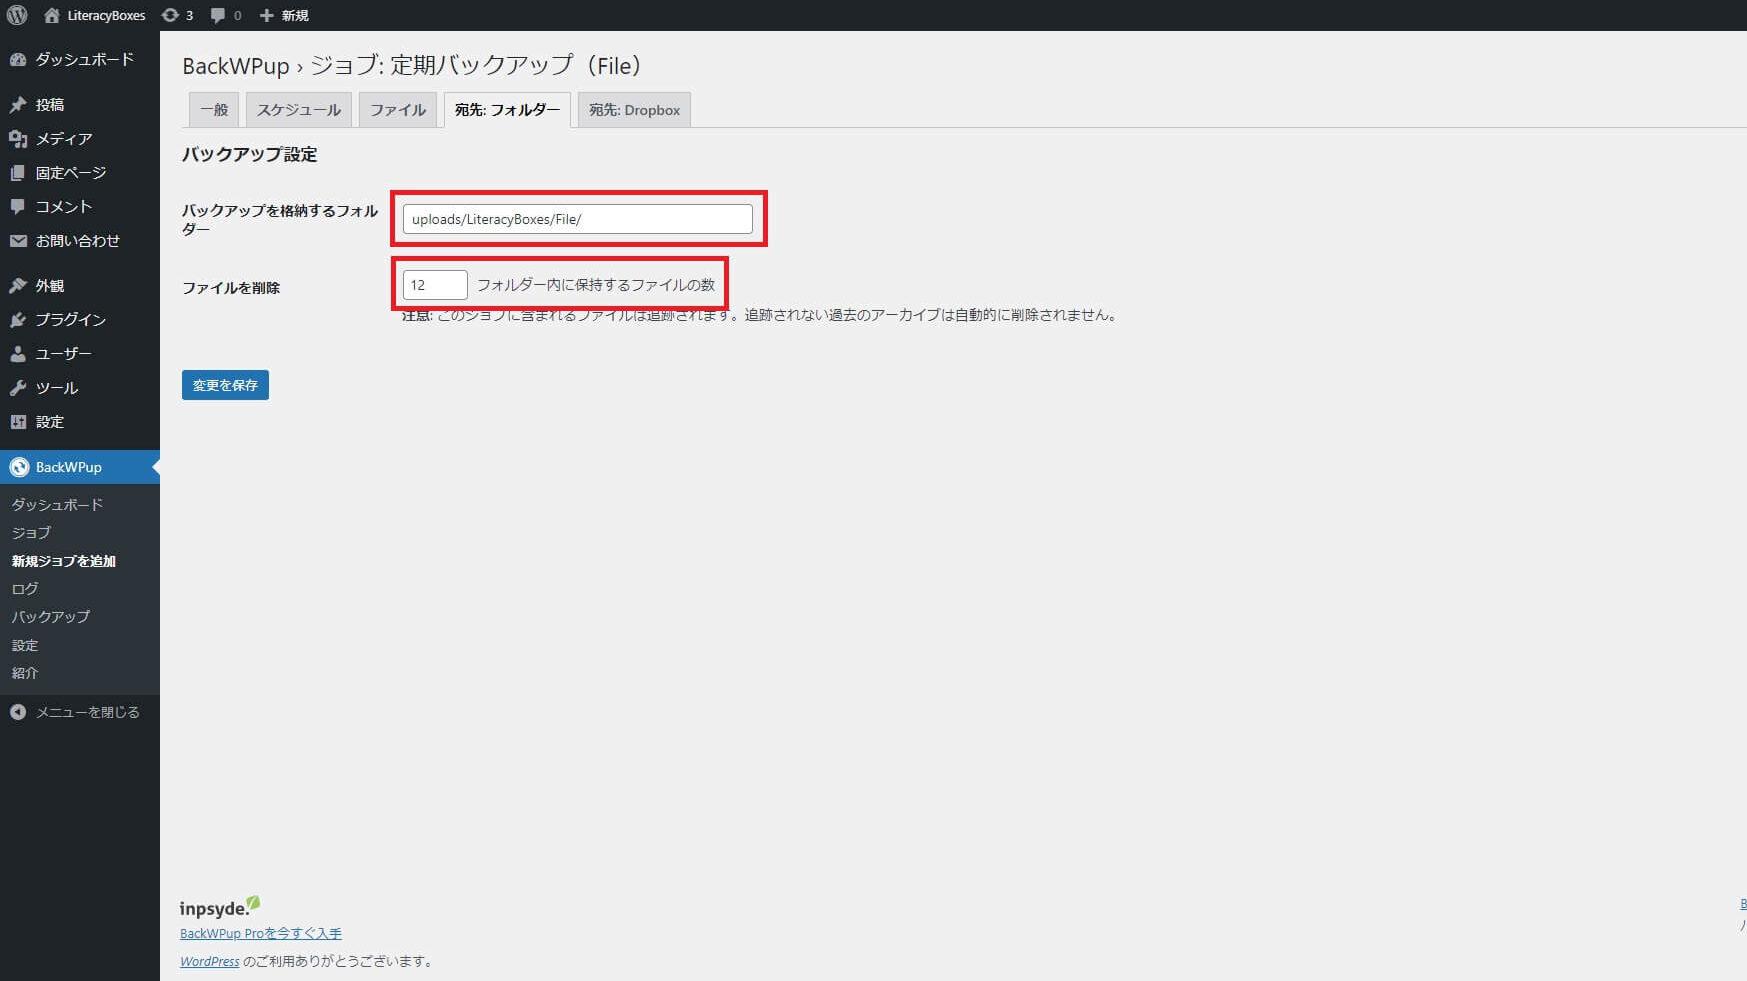 BackWPupジョブ新規追加 - 宛先:フォルダー(File)